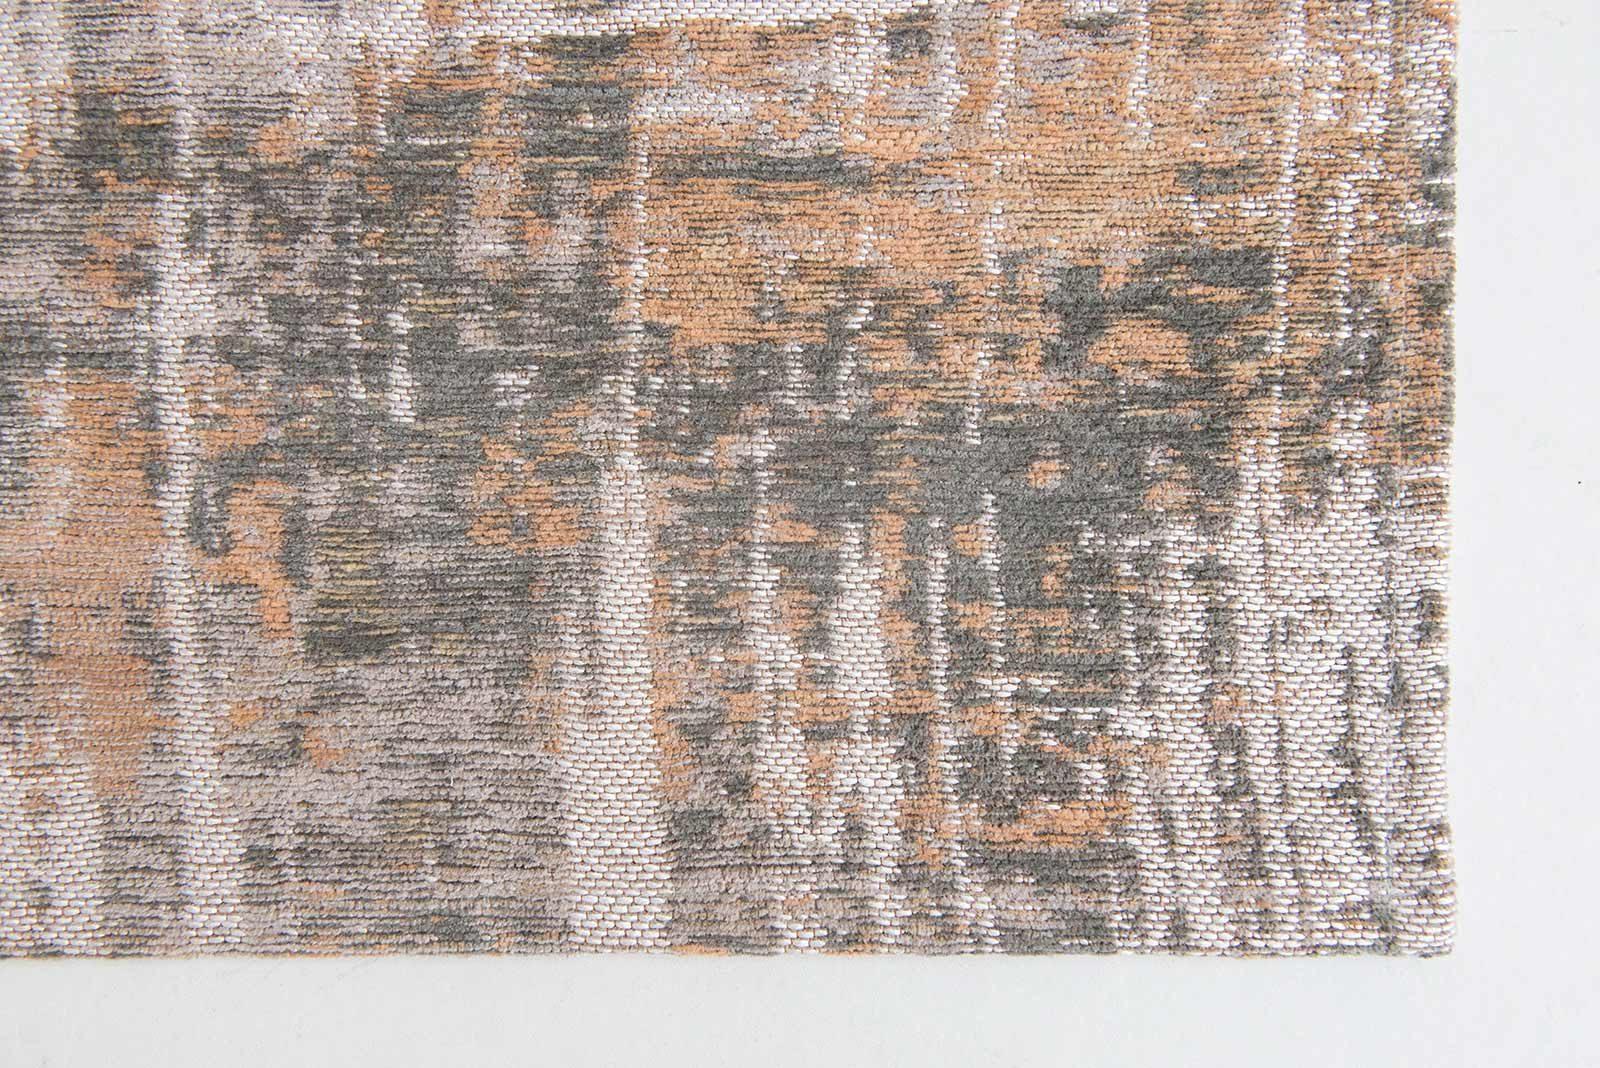 alfombras Louis De Poortere LX8717 Atlantic Streaks Parsons Powder corner